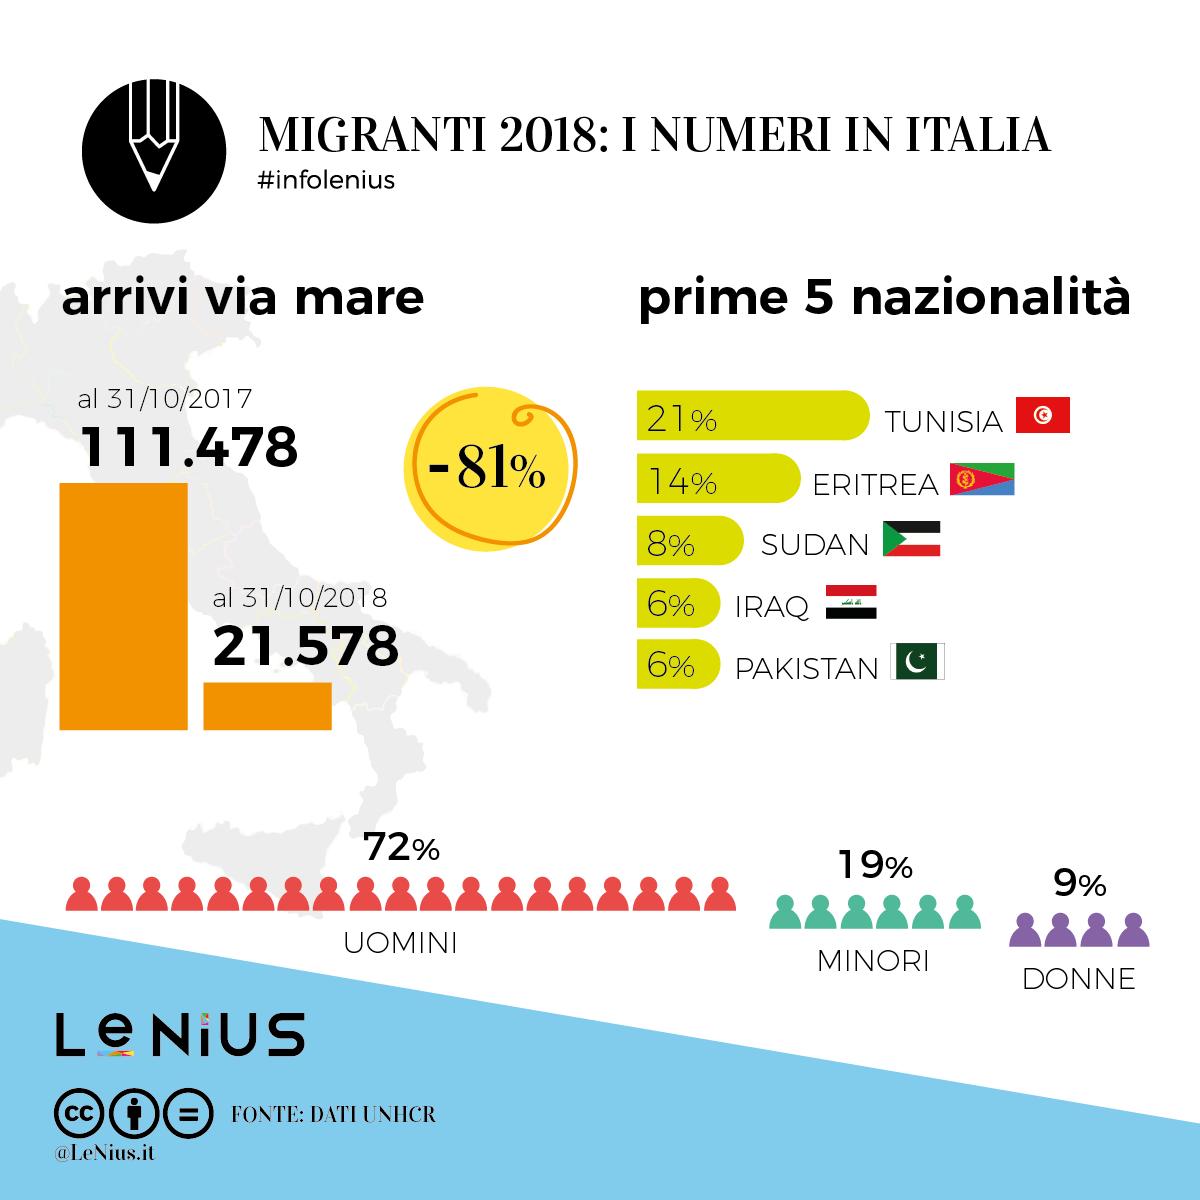 migranti 2018